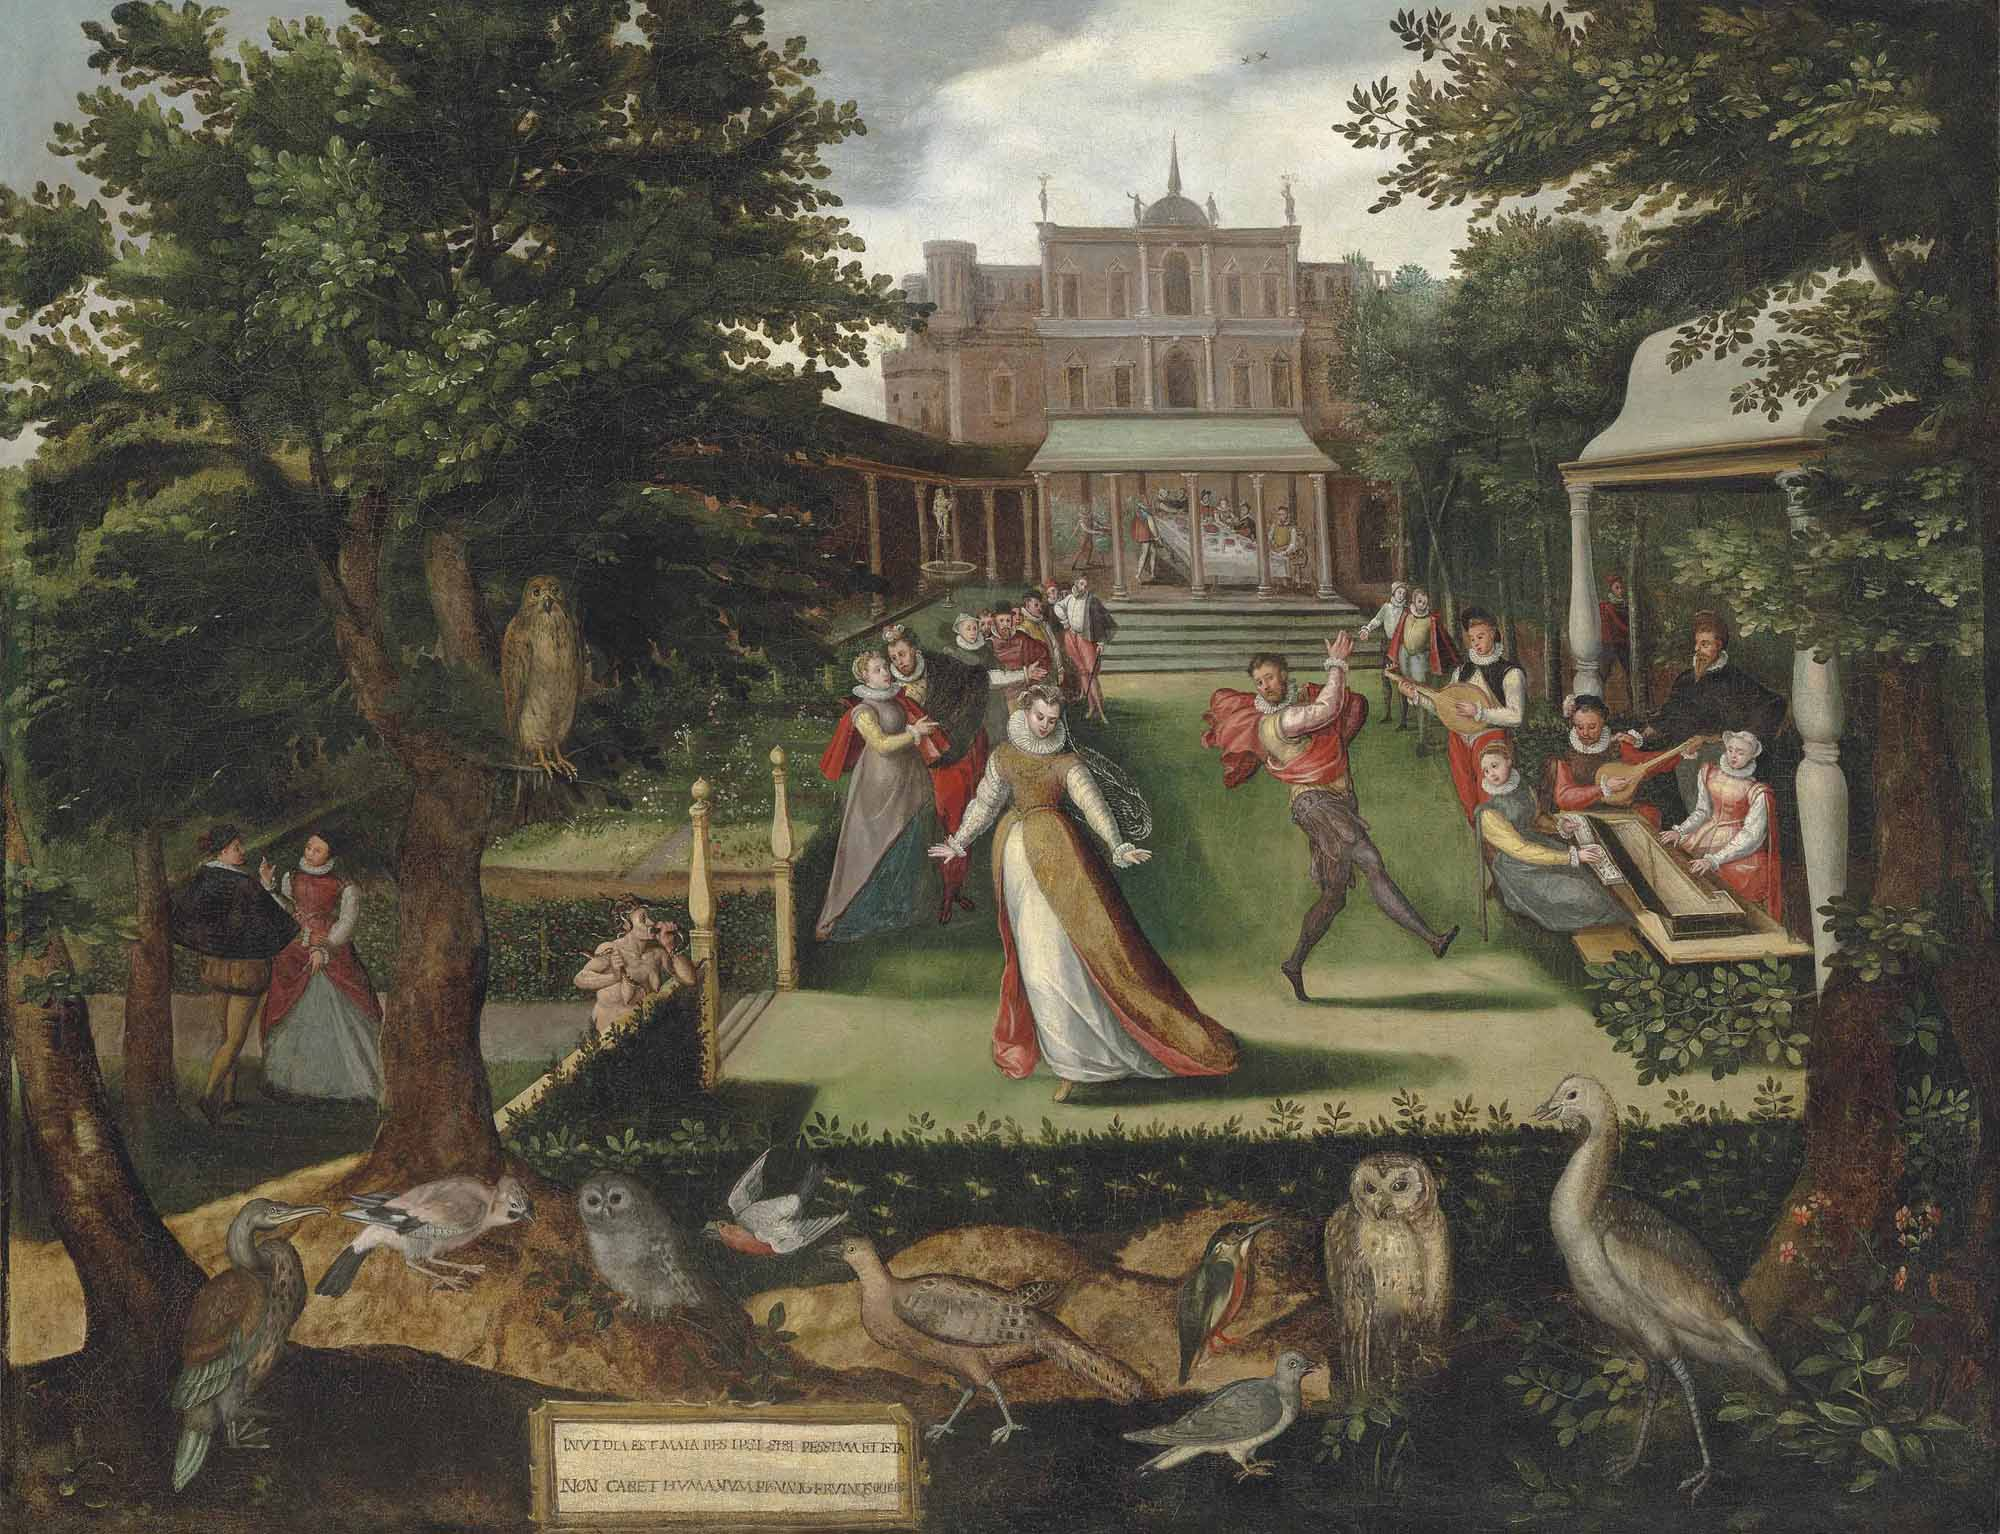 Elegantly dressed figures merrymaking in a garden